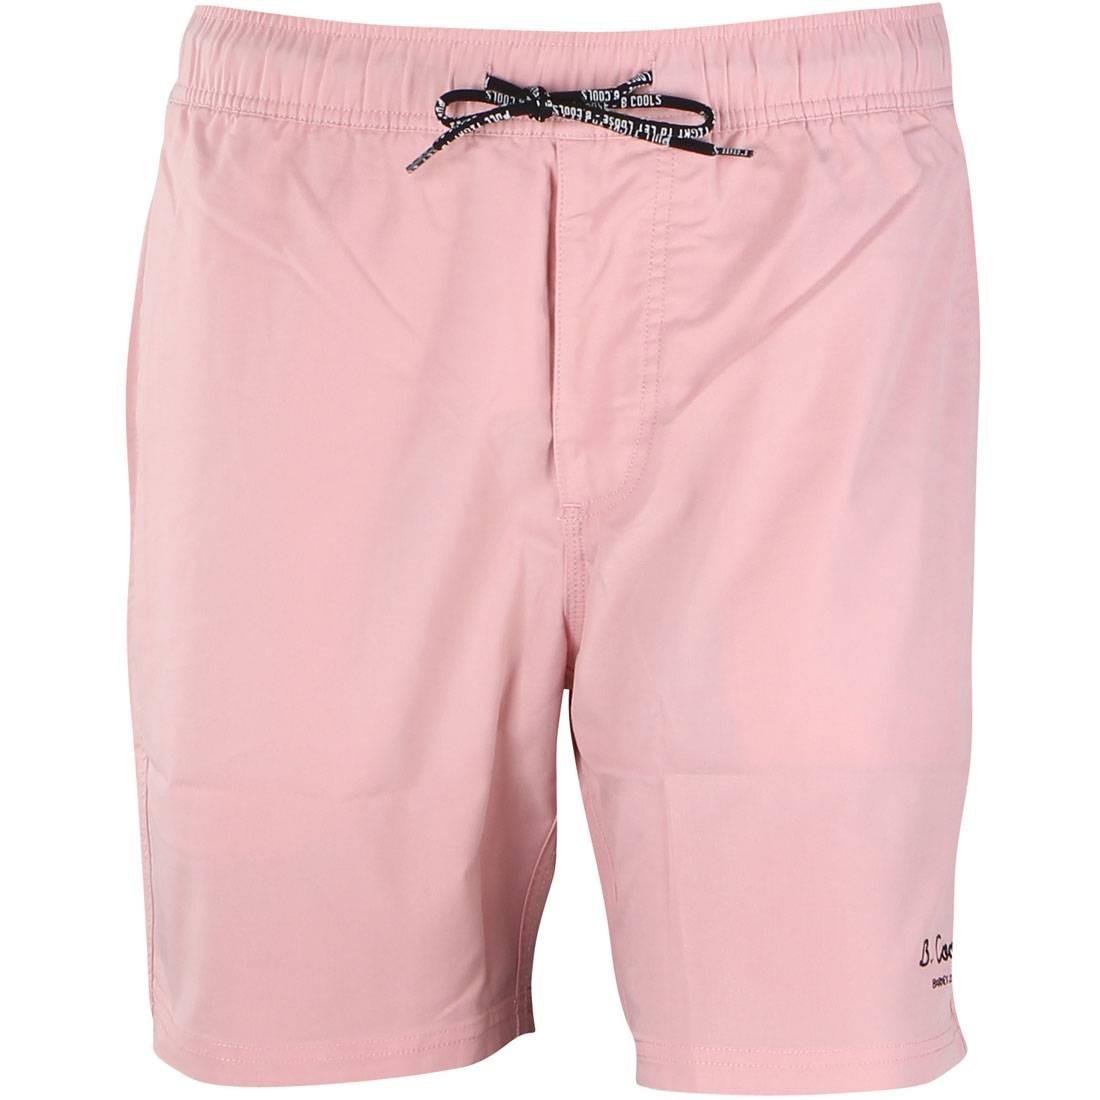 Barney Cools Men Shifty Shorts (pink)